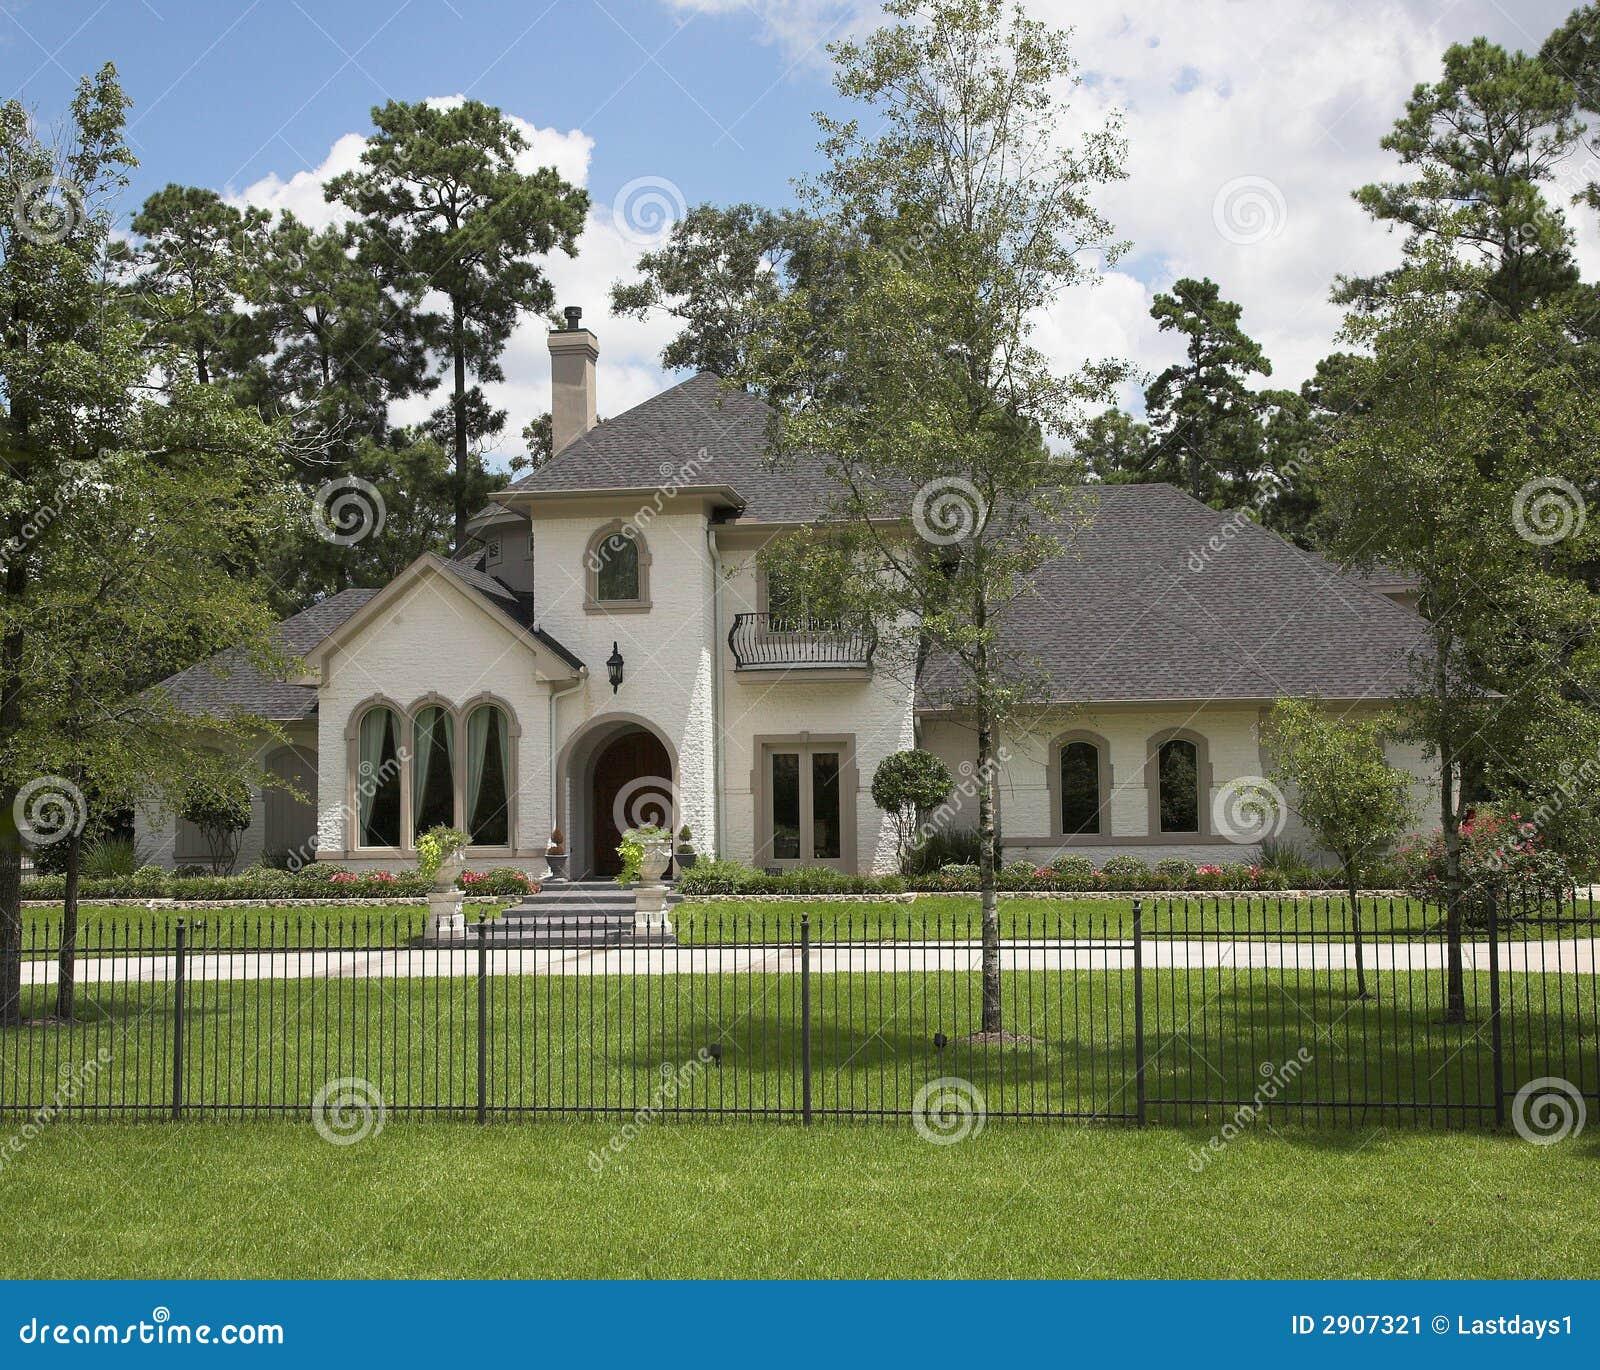 million dollar homes show